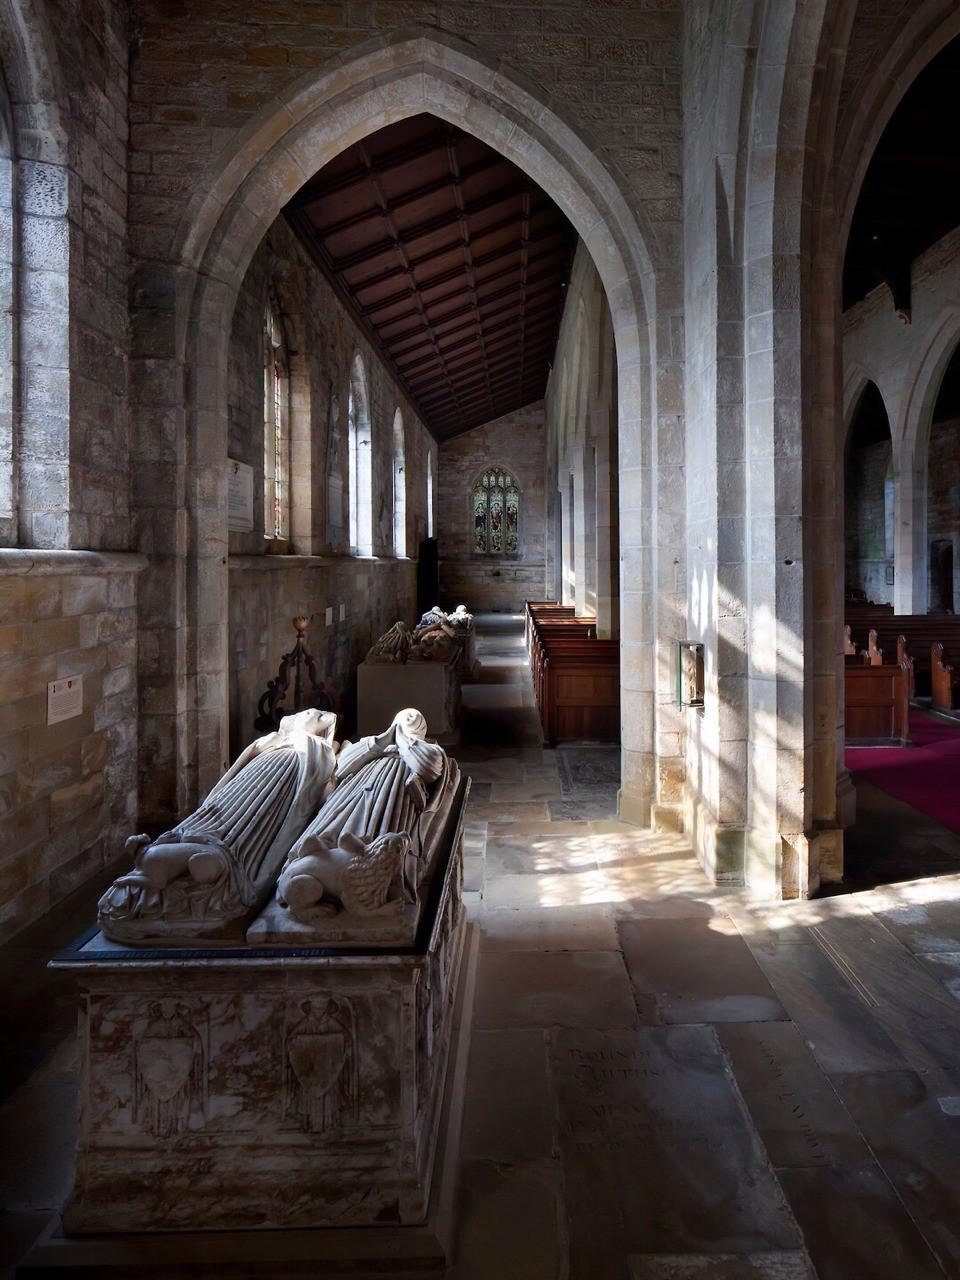 All Saint's, Harewood, Yorkshire, UK - follow me on Instagram: @fotofacade